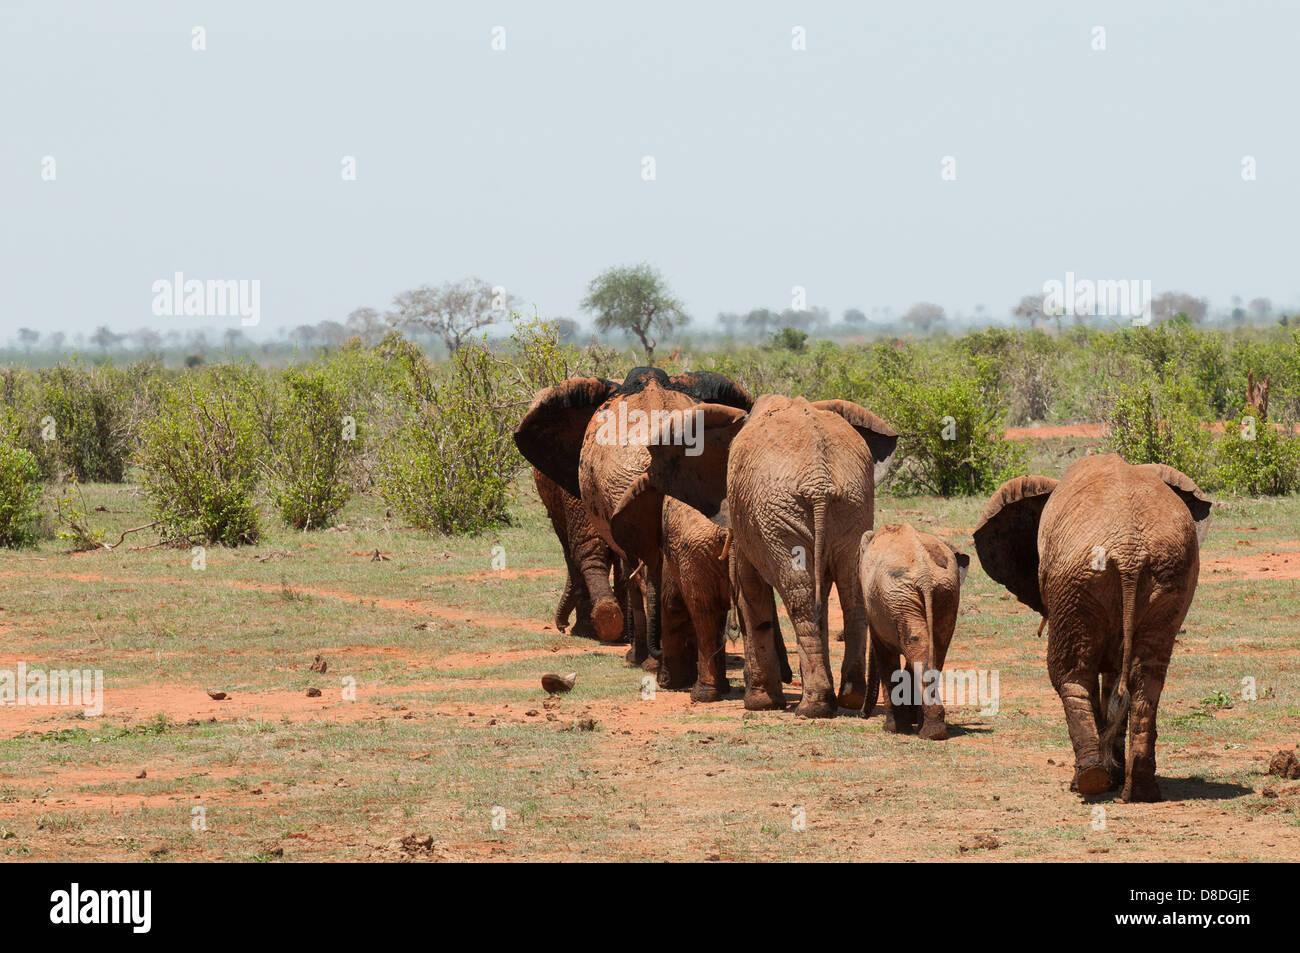 elephants in Tsavo National Park Kenya - Stock Image